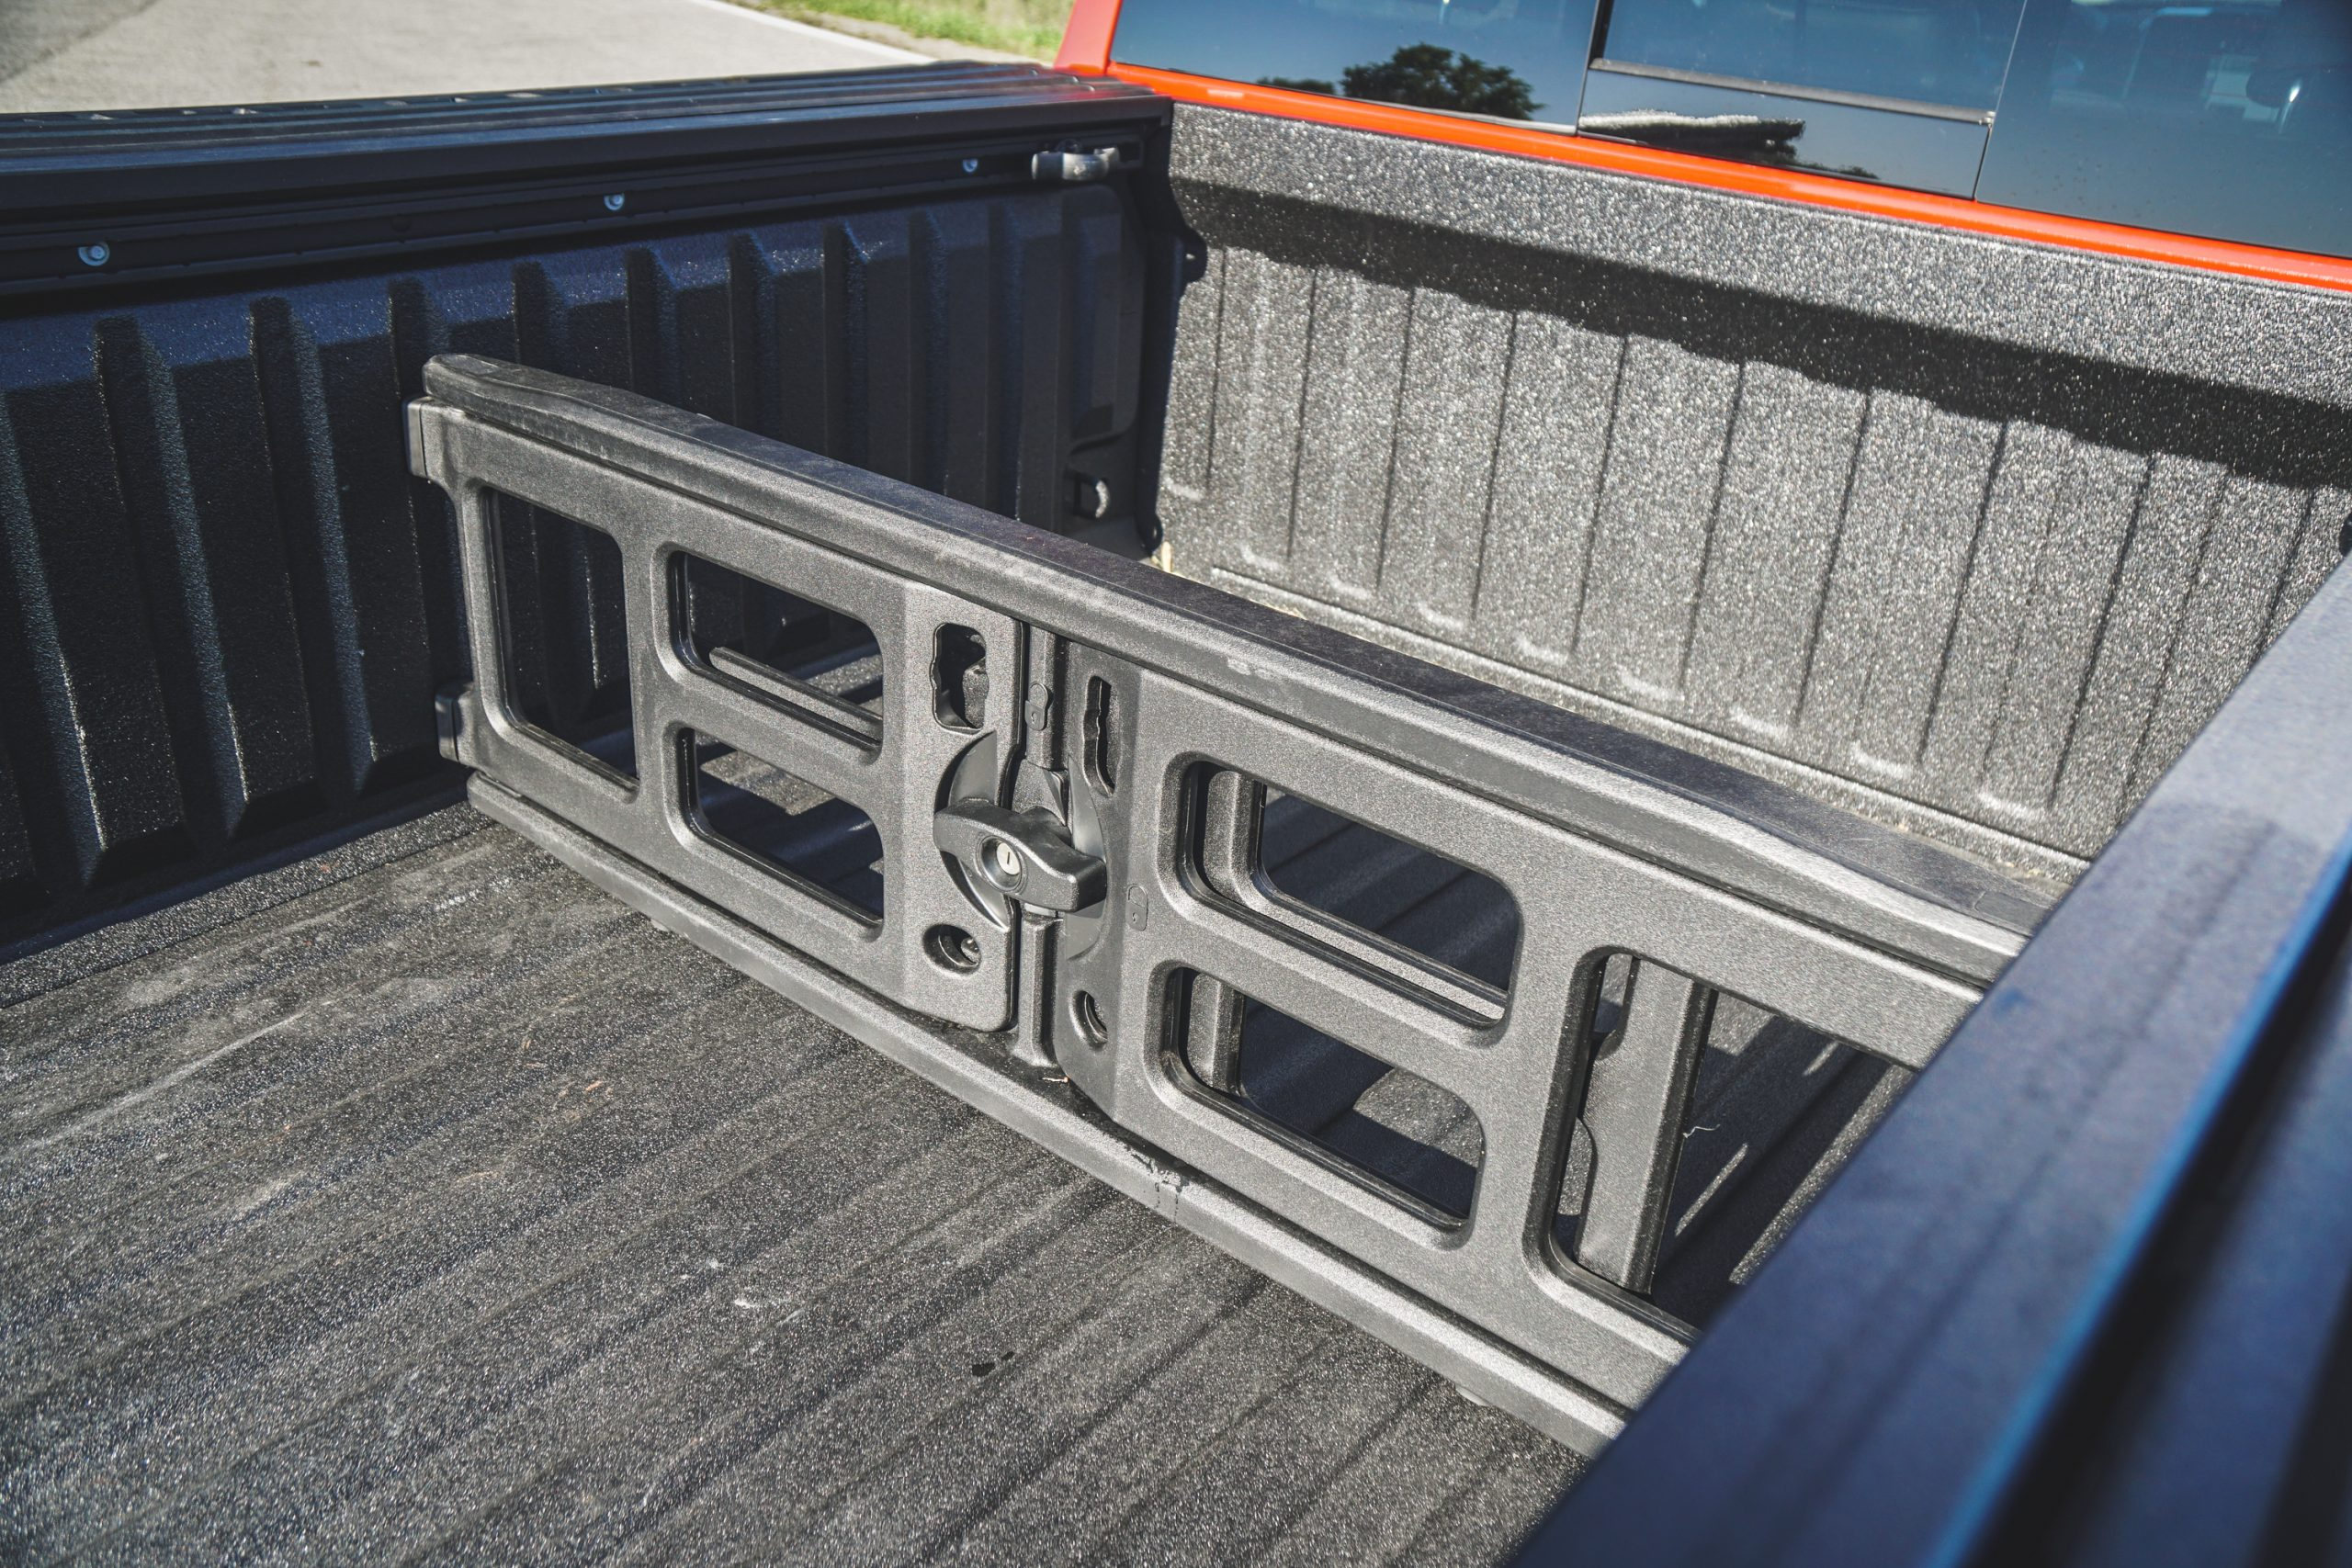 2020 Ram 1500 Laramie bed divider